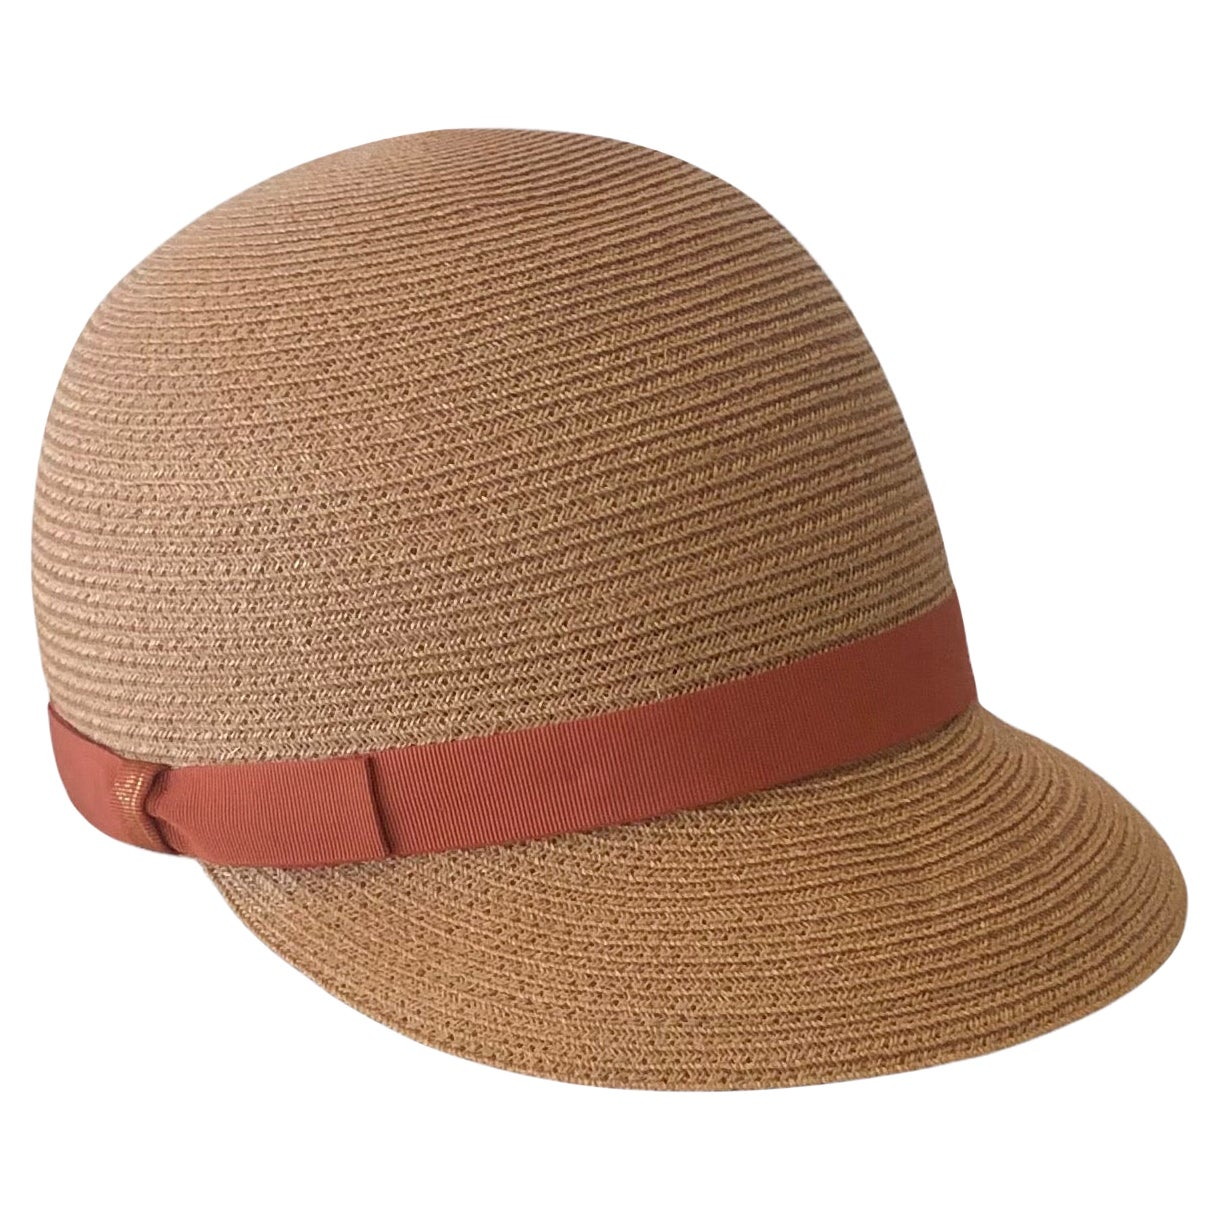 Borsalino Woven Hemp Baseball Cap